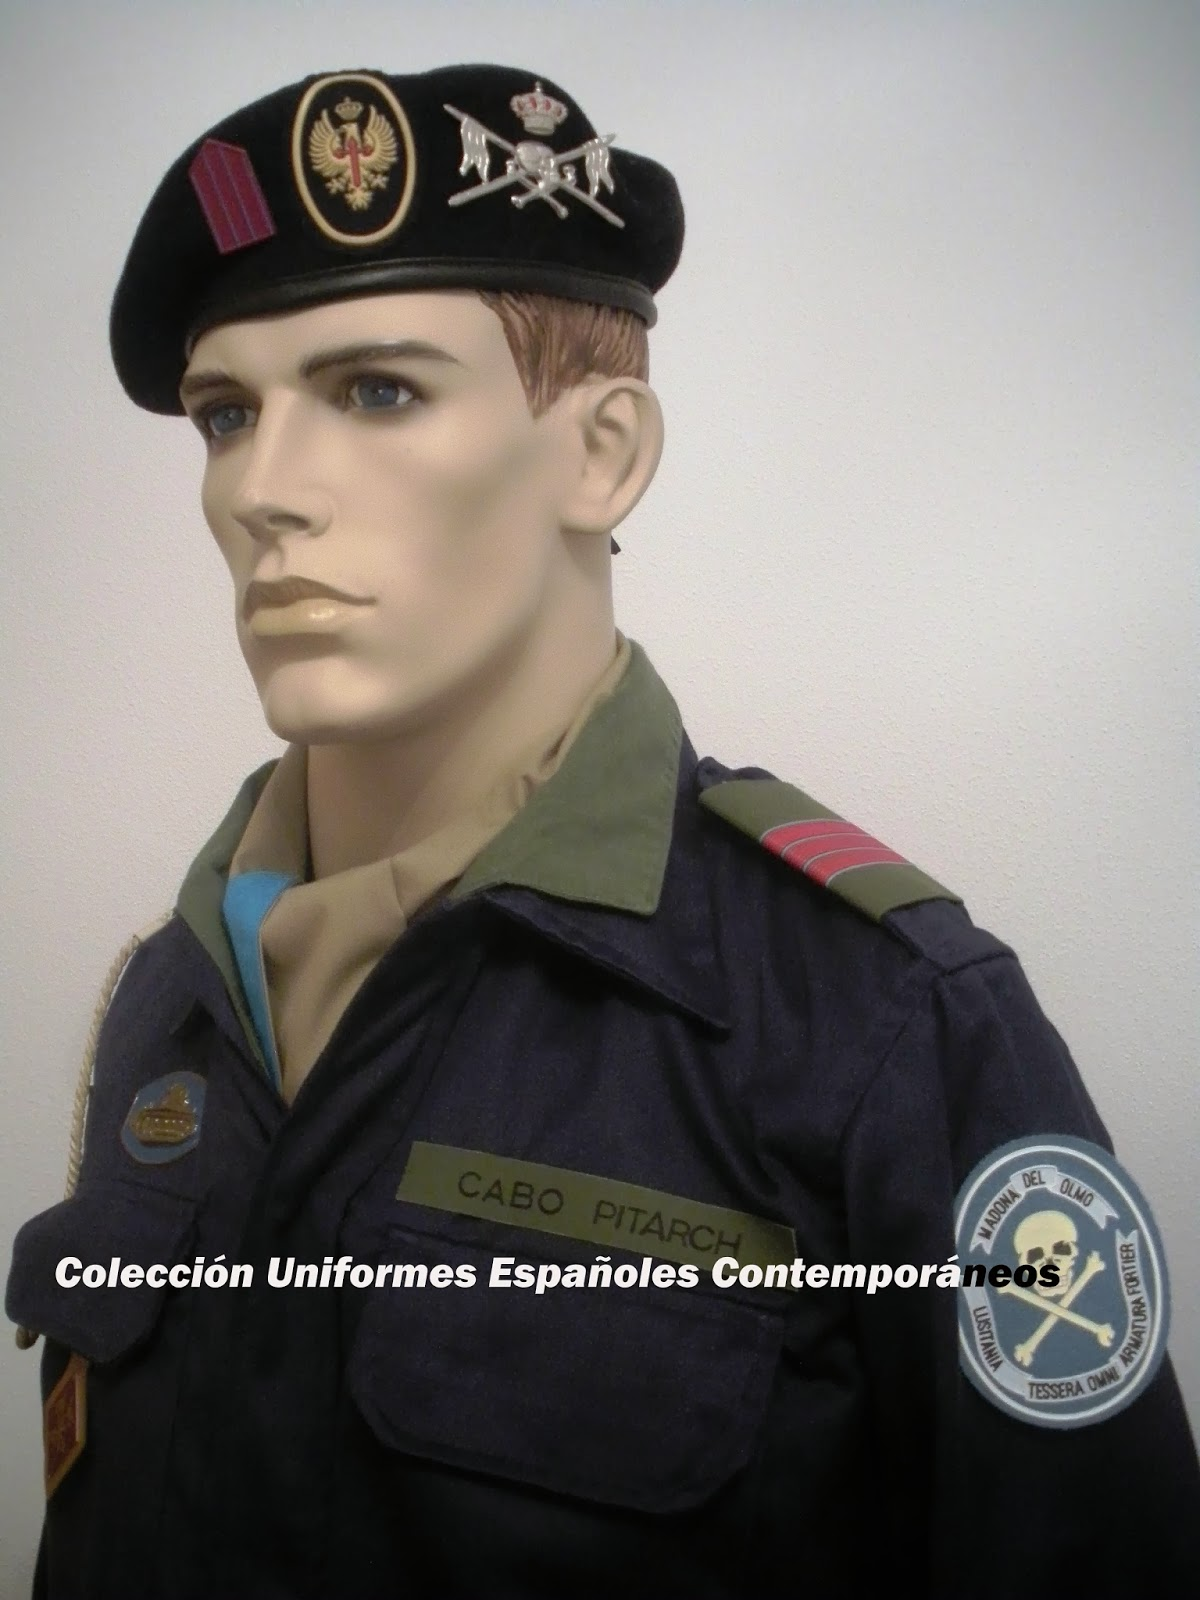 Uniformes españoles contemporáneos del ejército español  septiembre 2013 b7be7d2de7e